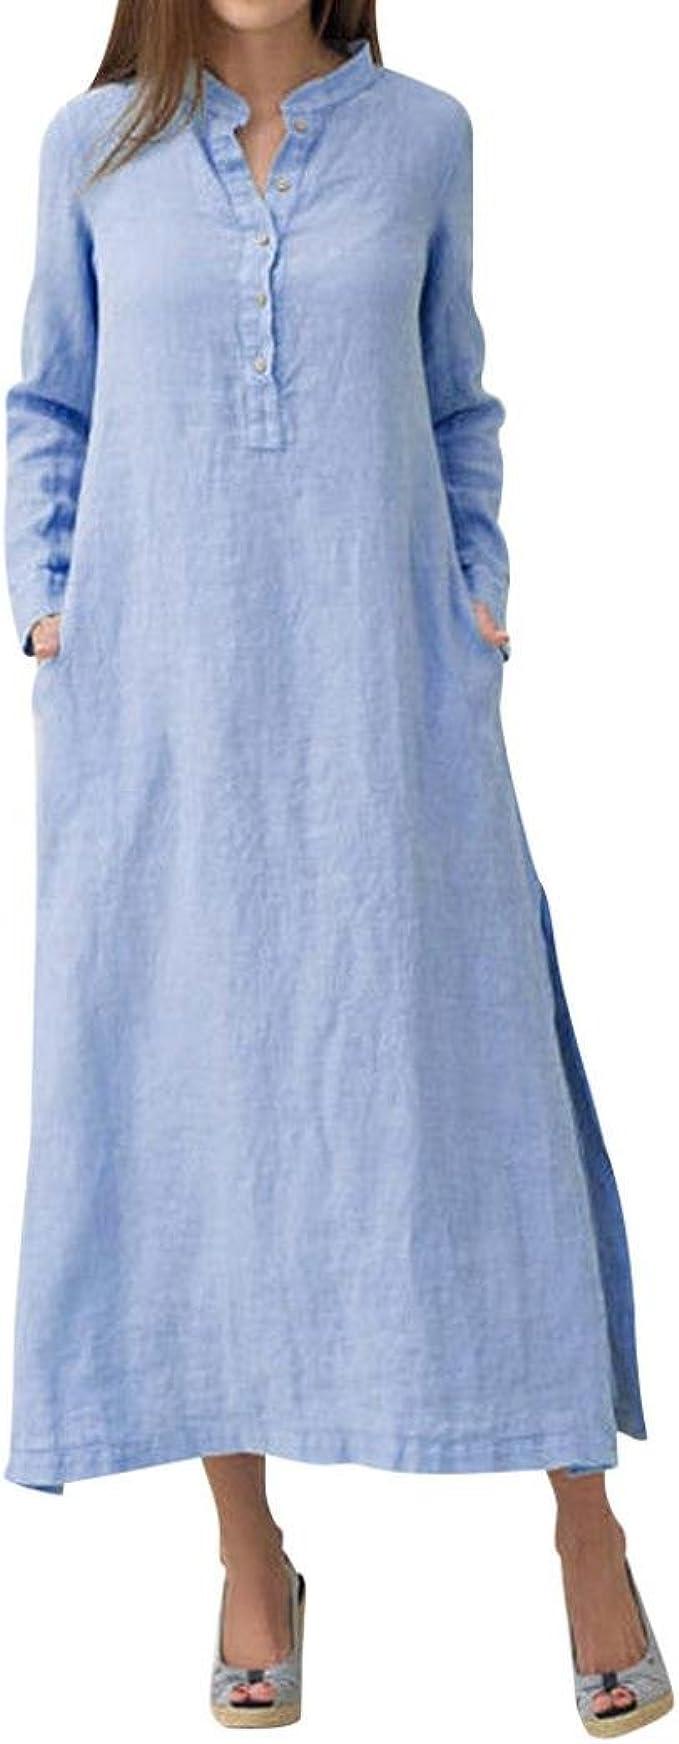 Damen Lange Kleider Goosuny Herbst Langarm Baumwolle Oversize ...